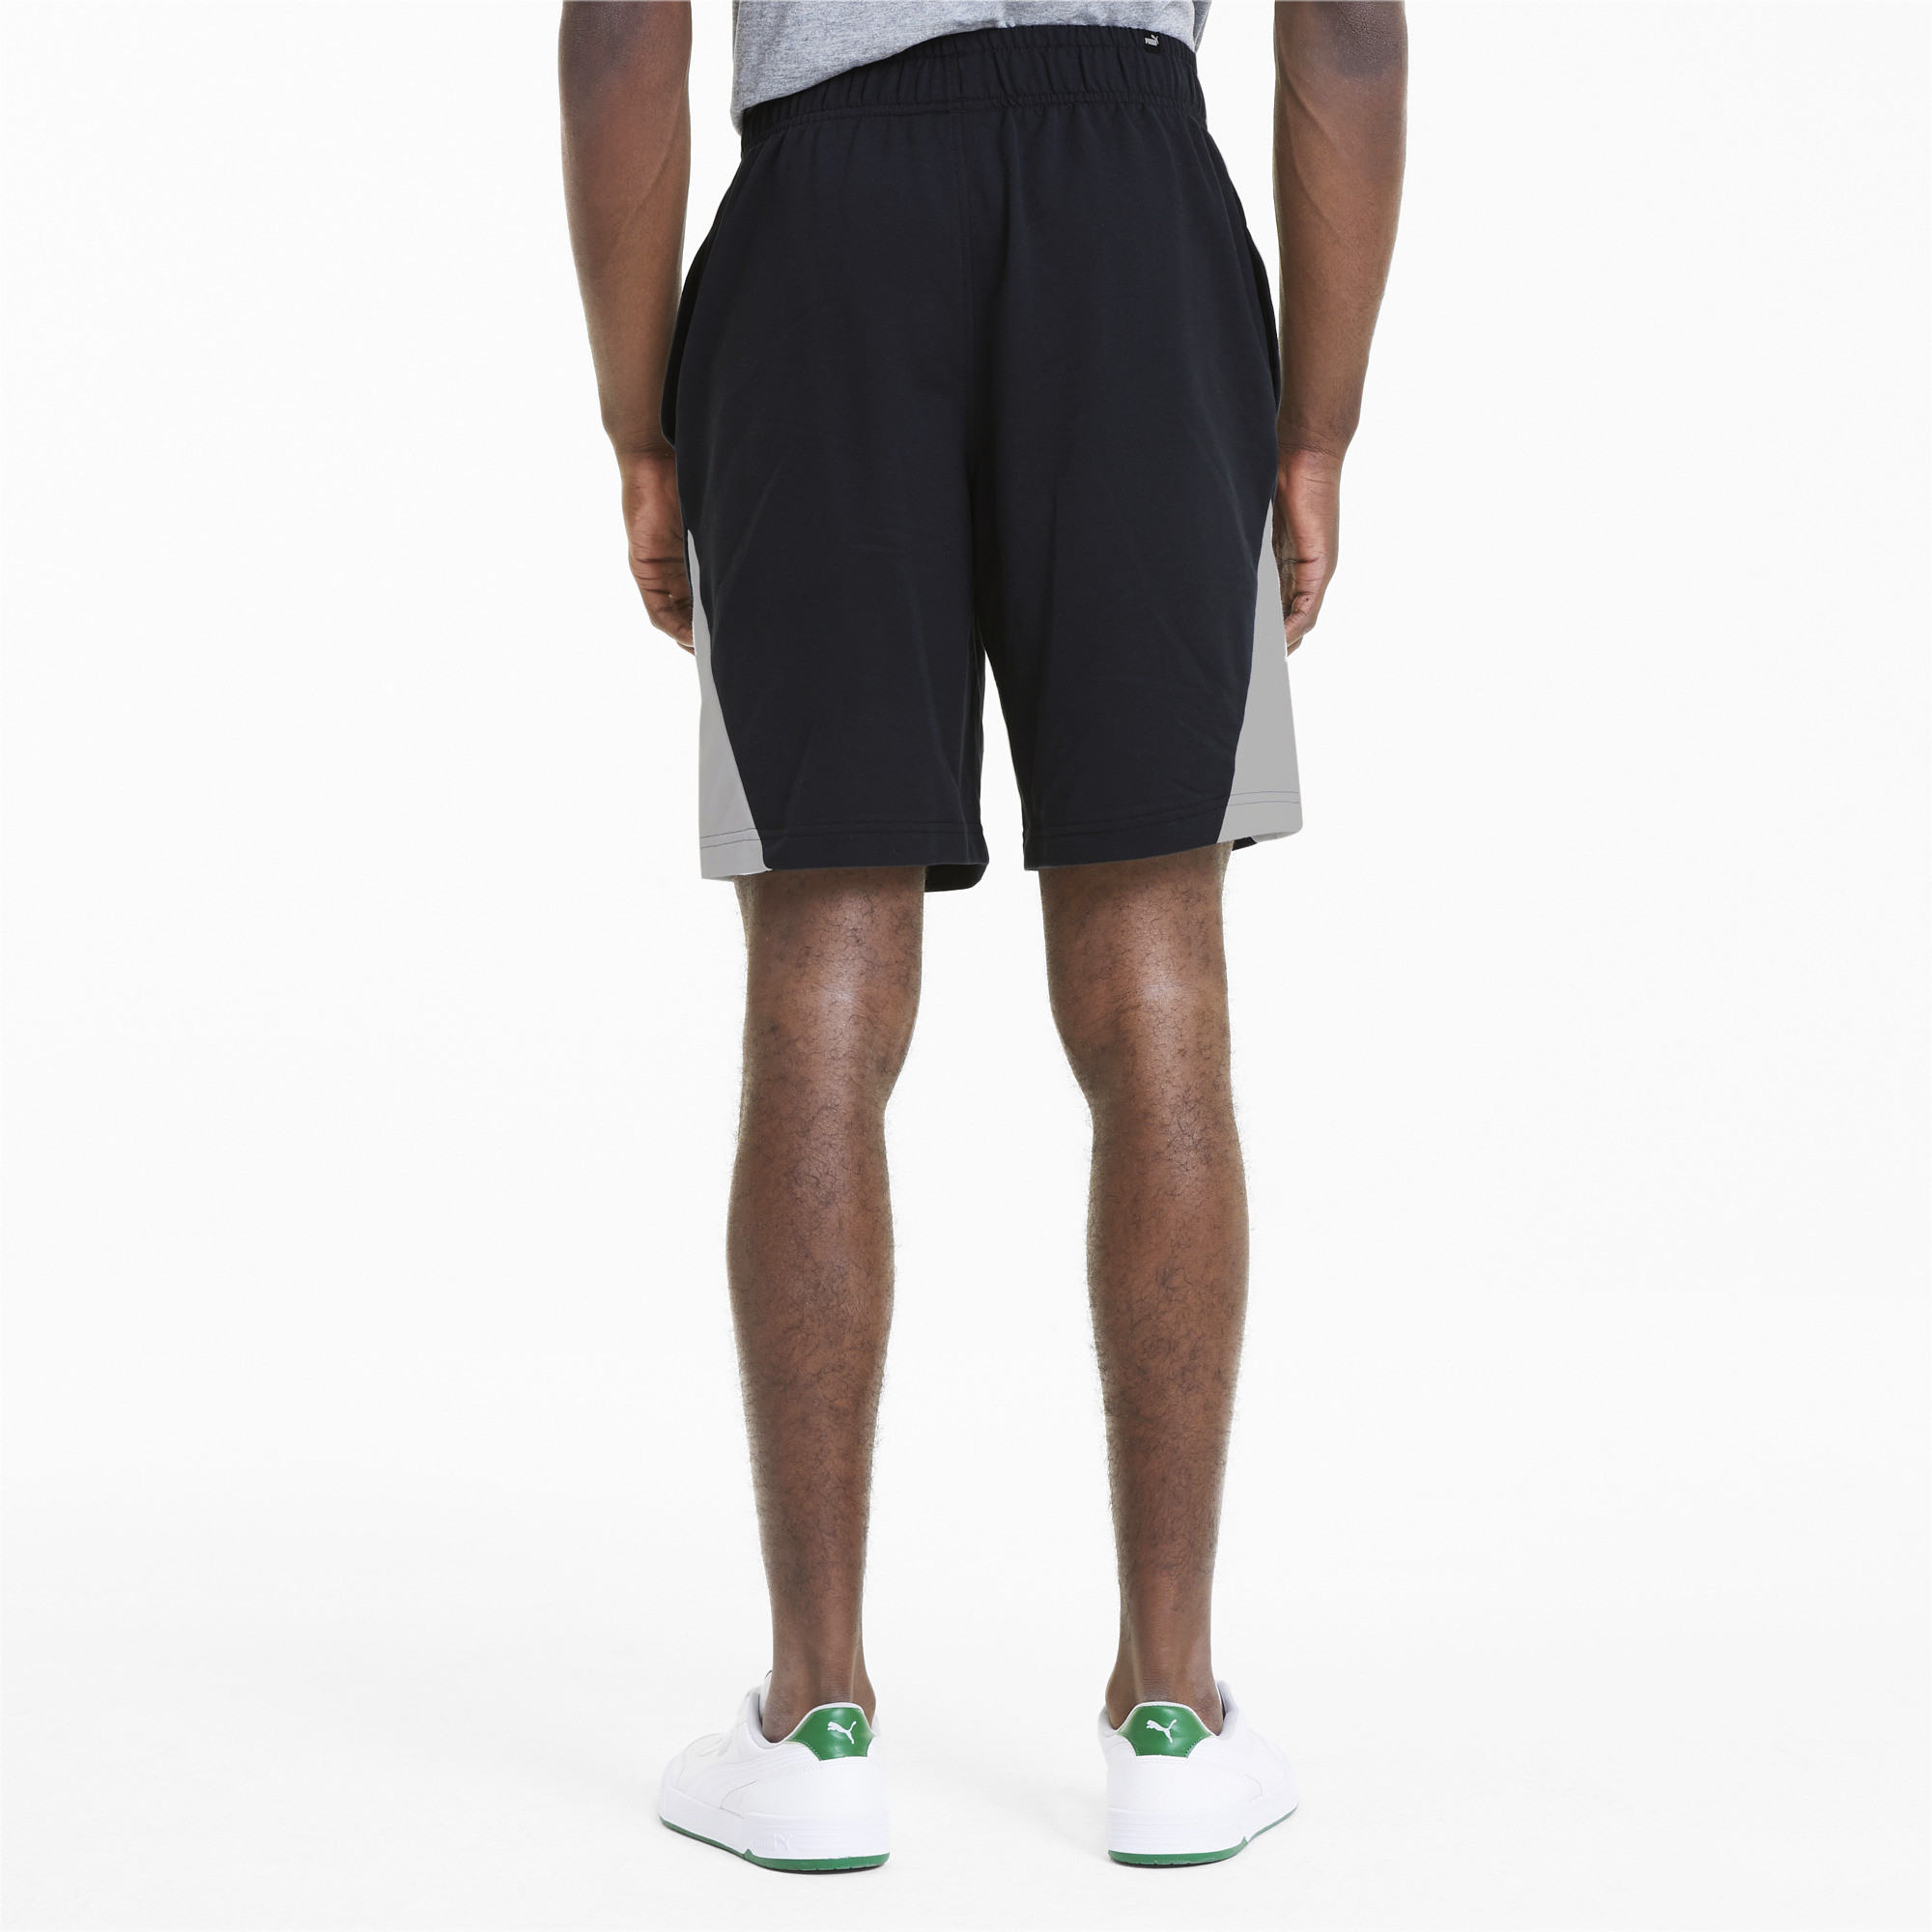 PUMA-Summer-Print-Men-039-s-Shorts-Men-Knitted-Shorts-Basics thumbnail 10